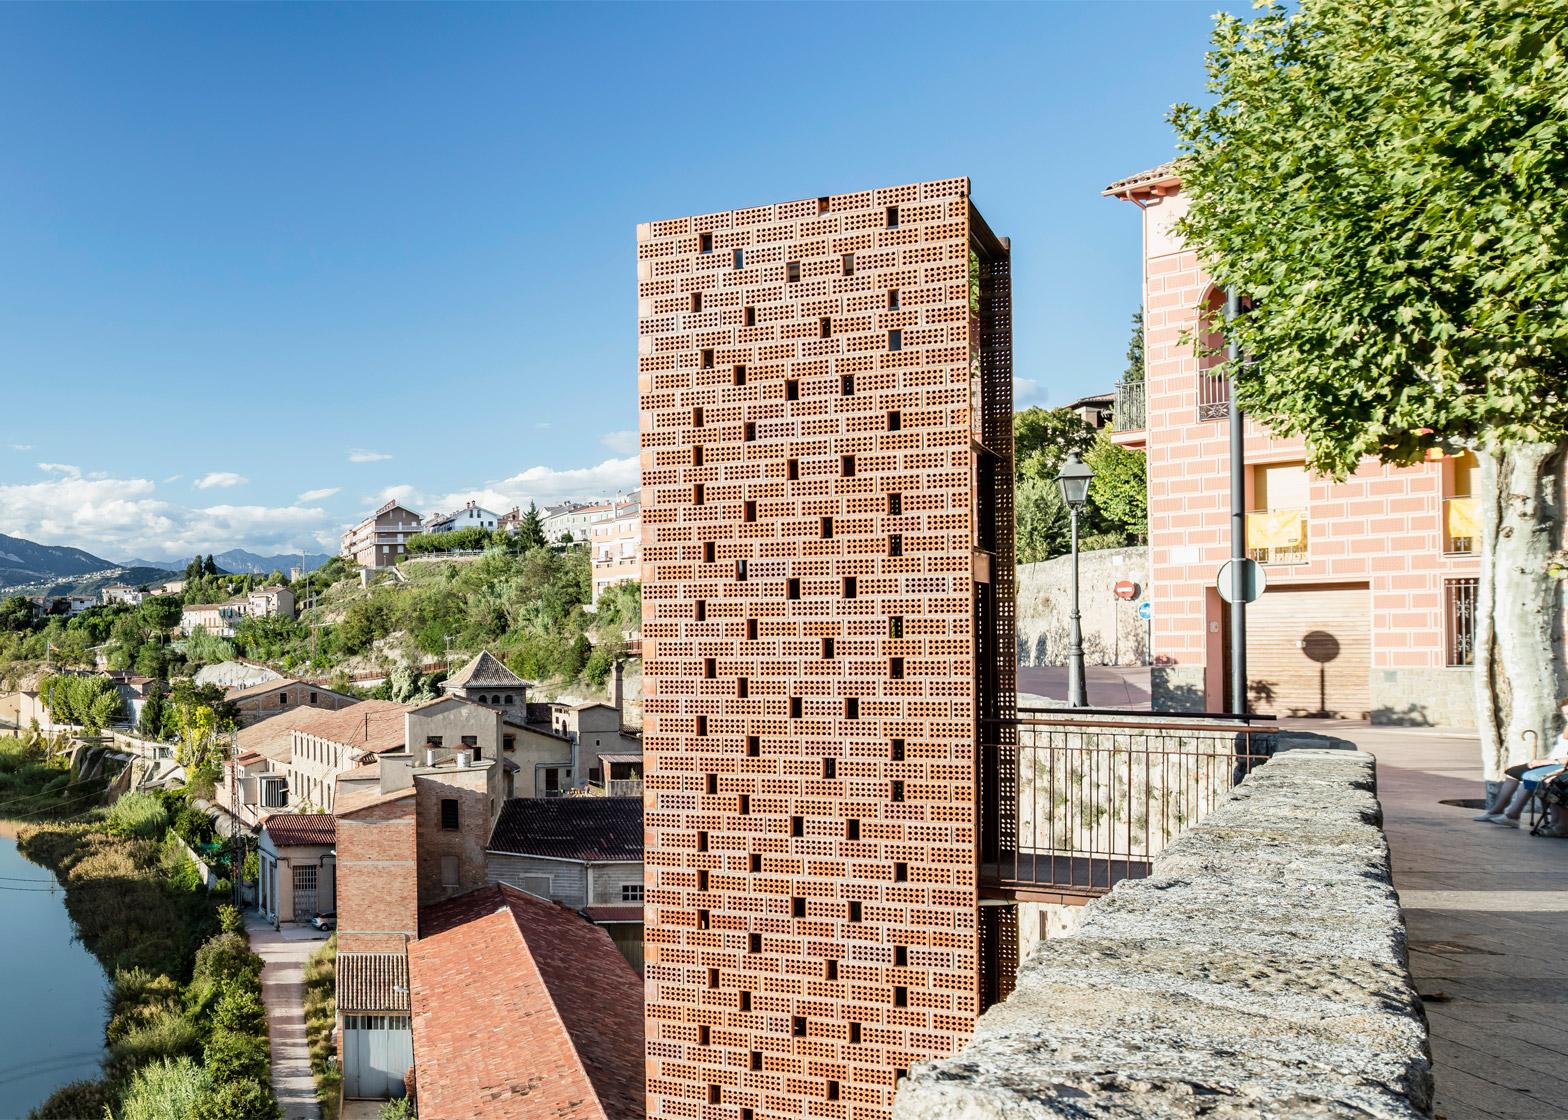 New-Access-to-Gironellas-Historic-Center_Barcelona-Spain_Carles-Enrich_dezeen_1568_3.jpg